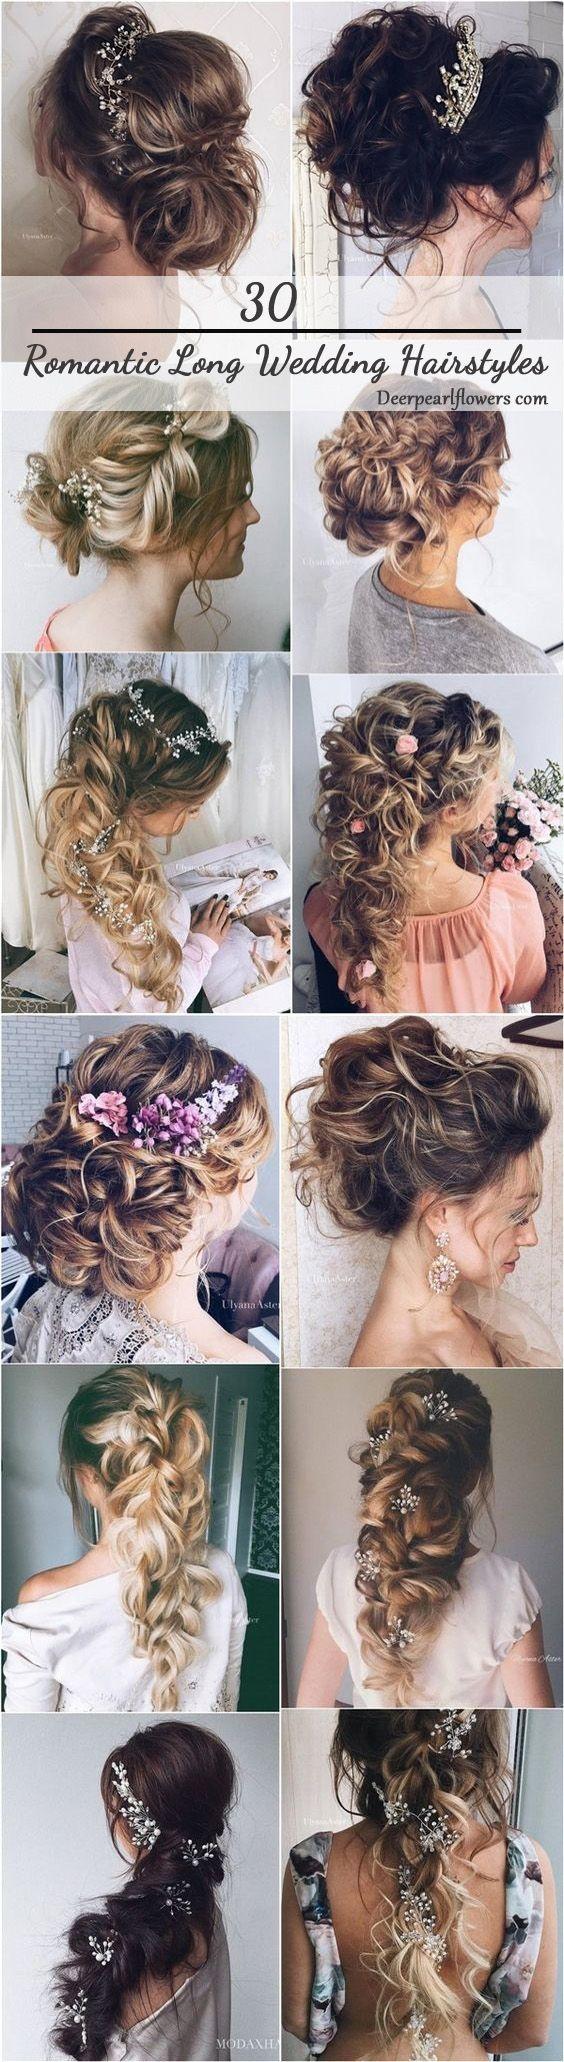 New Romantic Long Bridal Wedding Hairstyles to Try / http://www.deerpearlflowers.com/romantic-bridal-wedding-hairstyles/